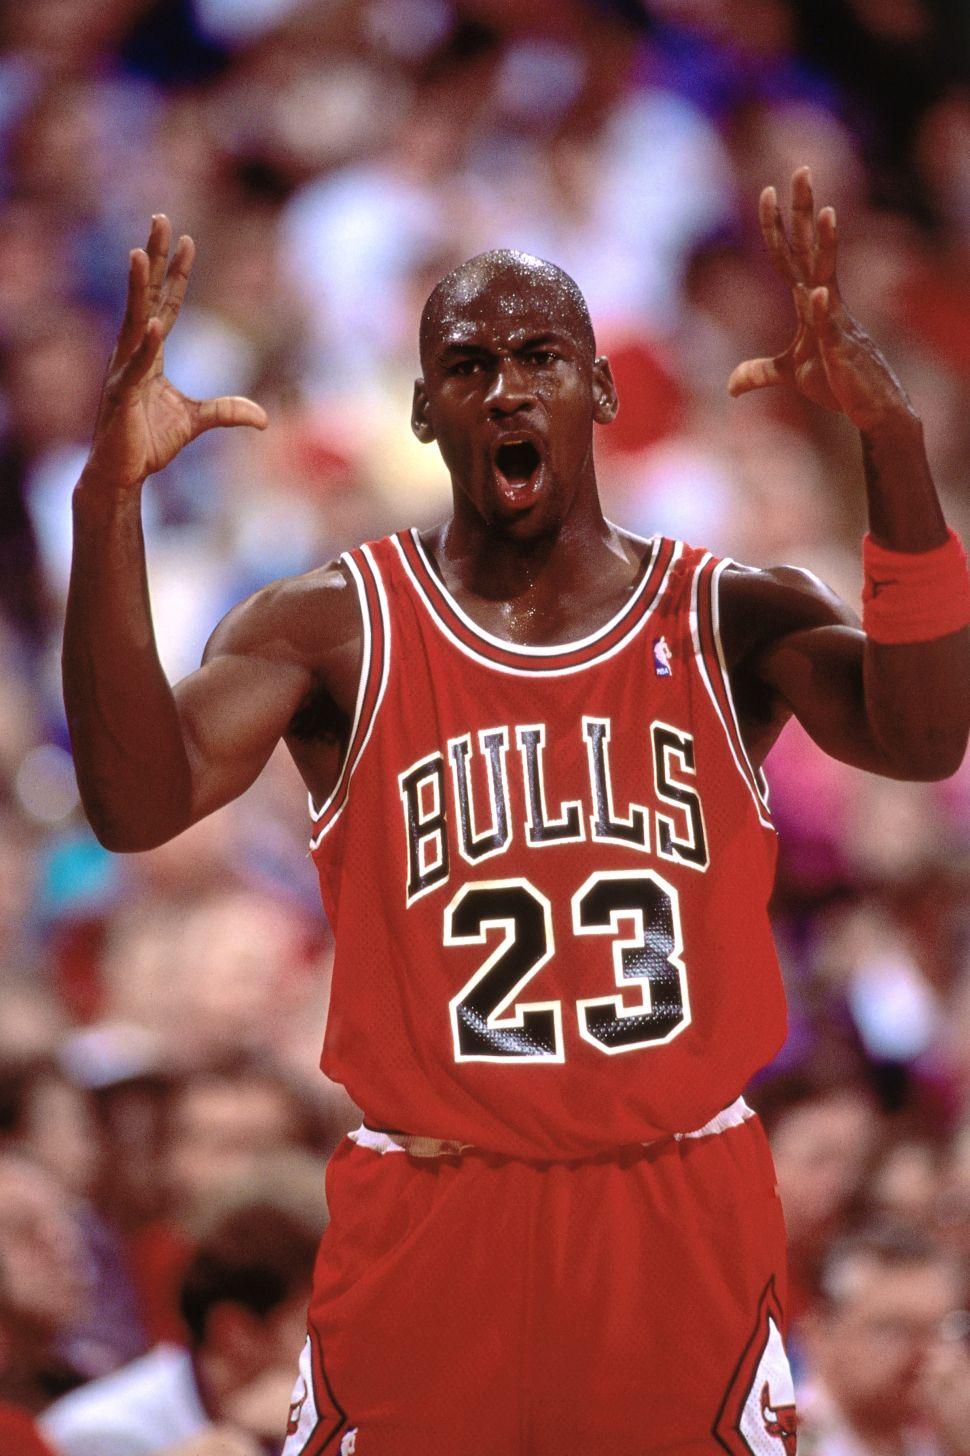 Michael Jordan of the Chicago Bulls 23